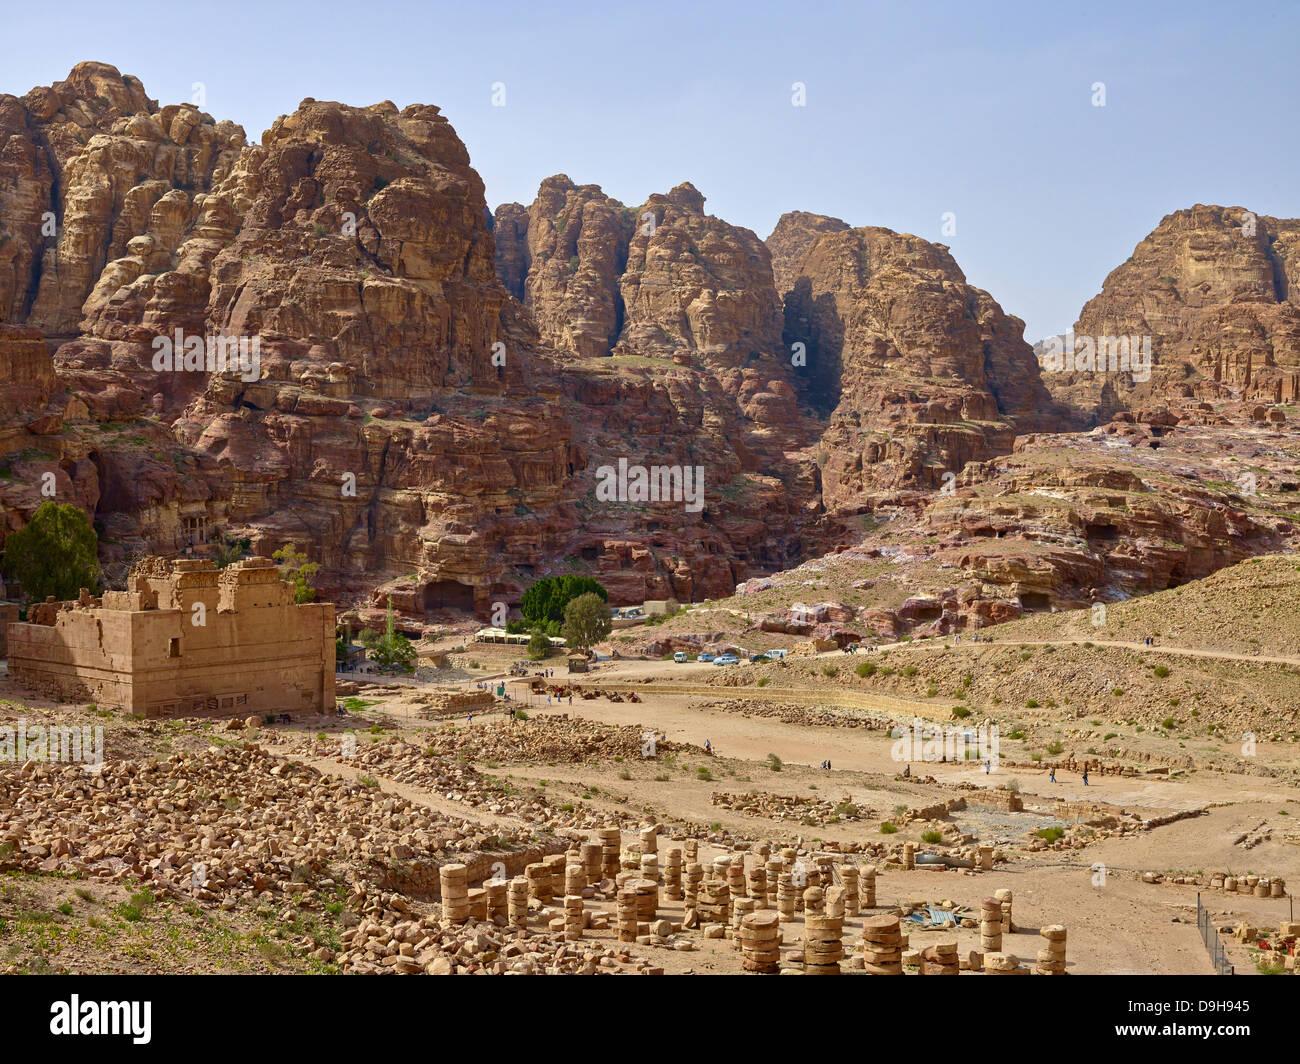 Wadi Musa mit dem Qasr el Bint, Großer Tempel, in der Felsenstadt Petra, Jordanien, Naher Osten - Stock Image